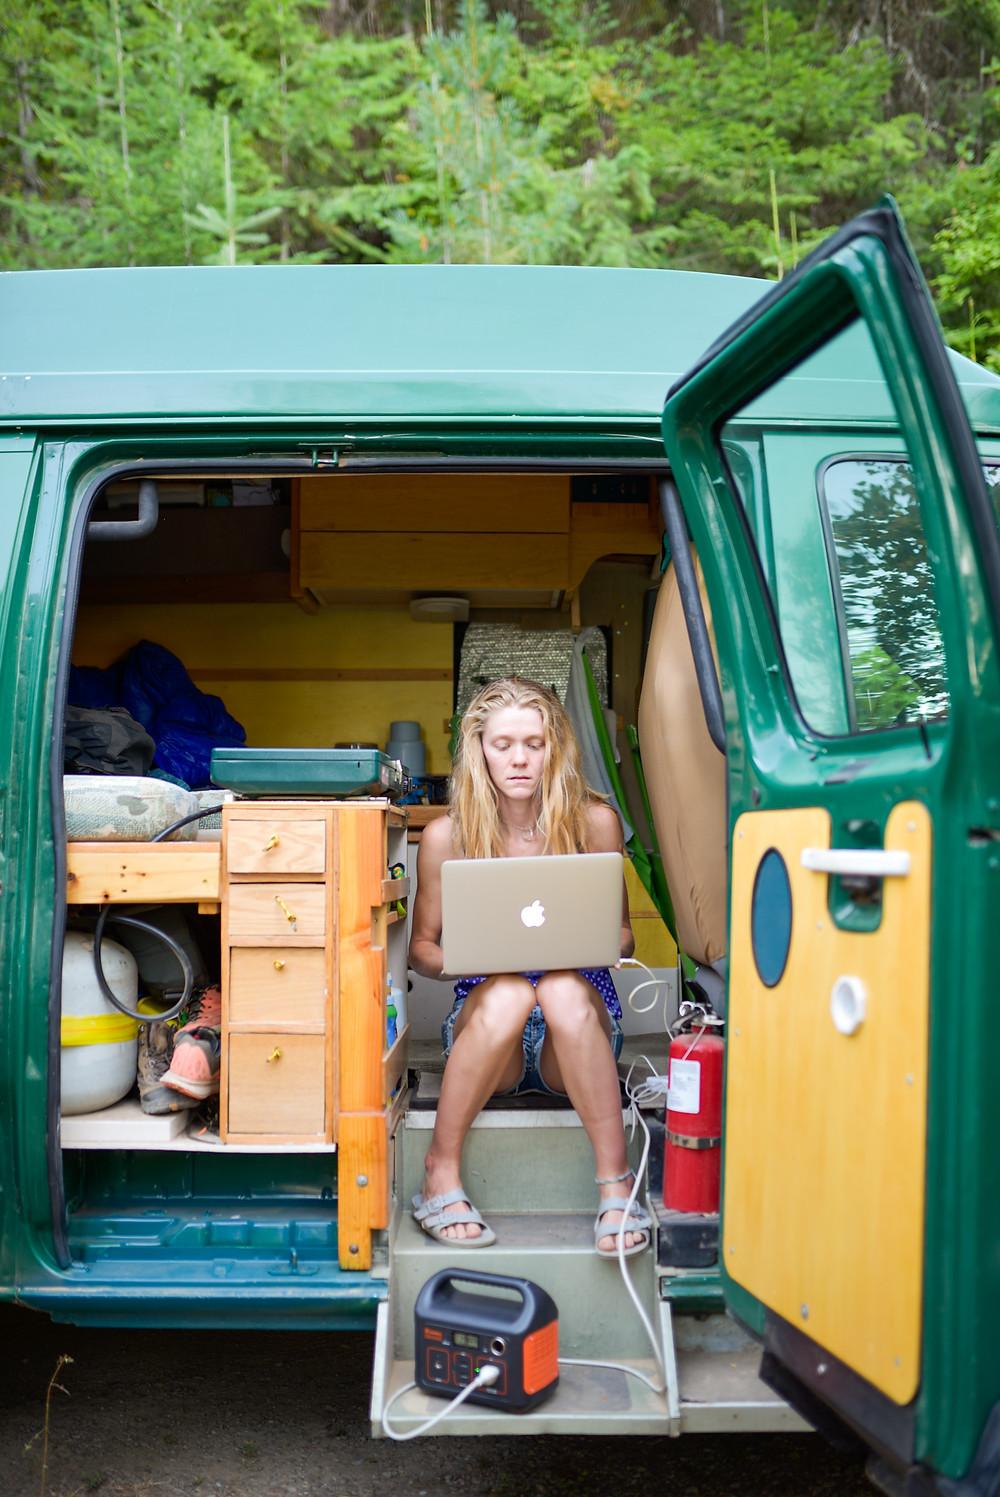 woman working on laptop inside van